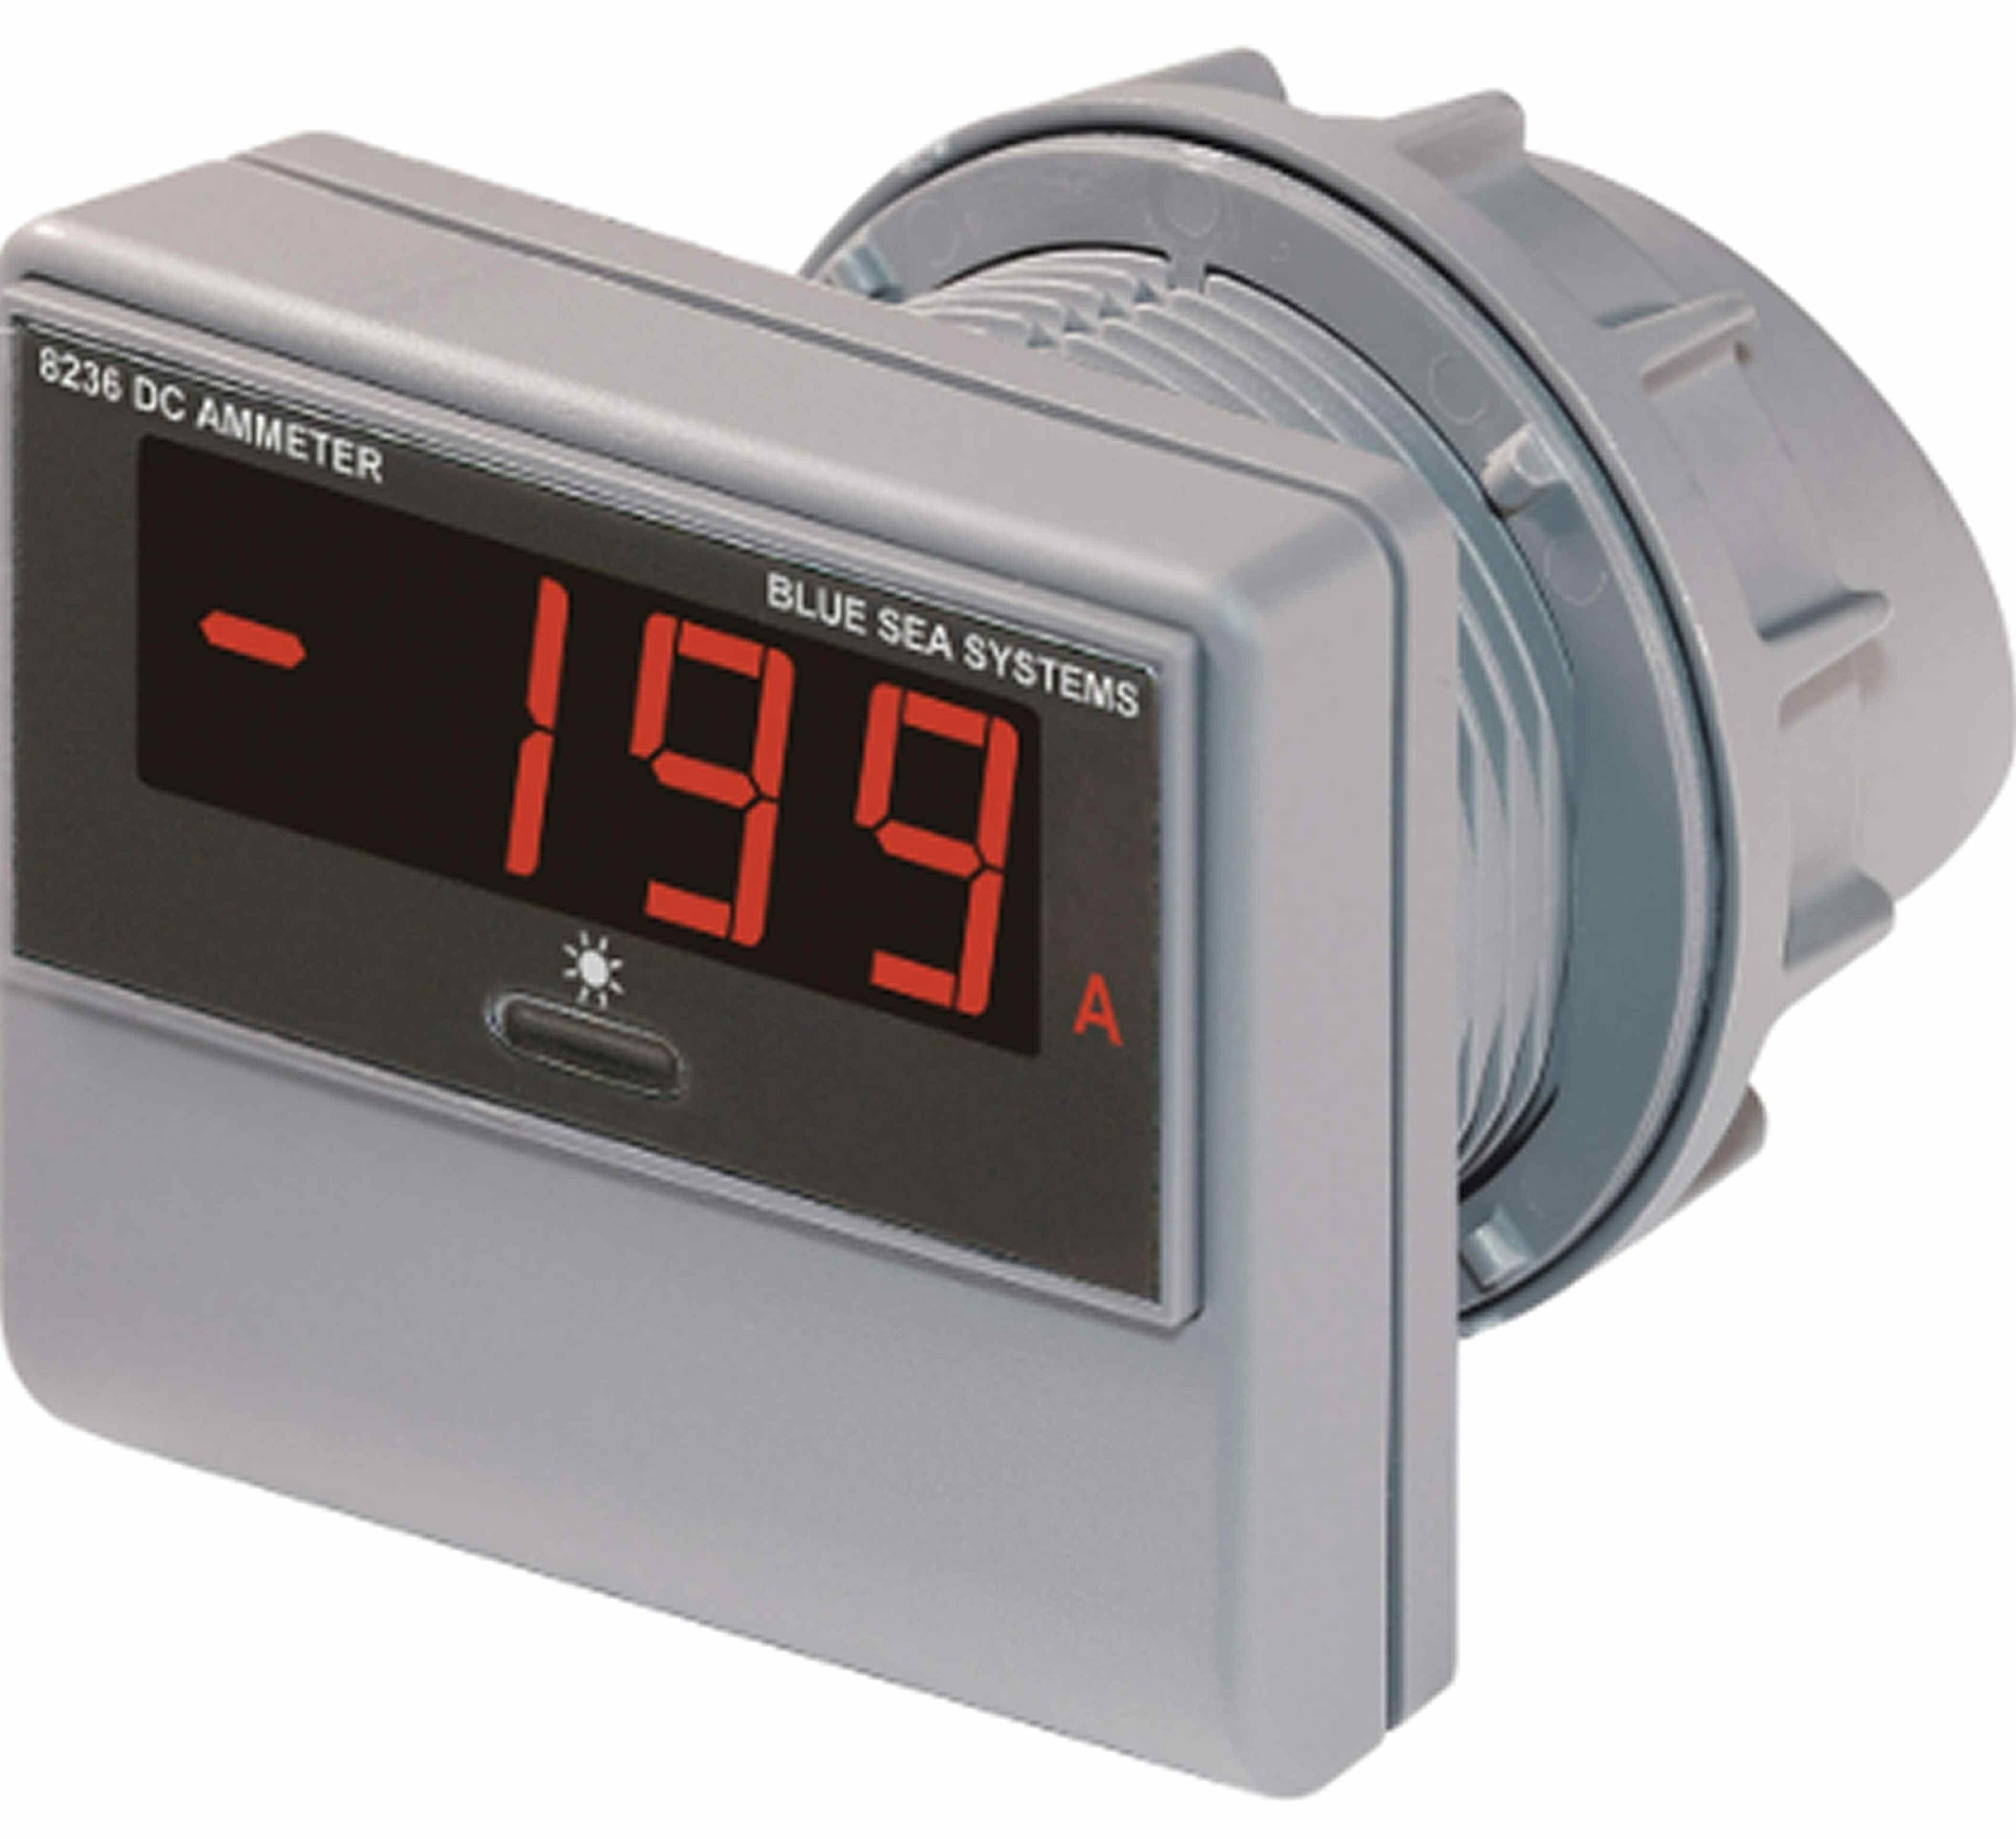 Blue Sea 8236 500a Digital Ammeter Alte Seas Ac Circuit Breakers Alternating Current Are